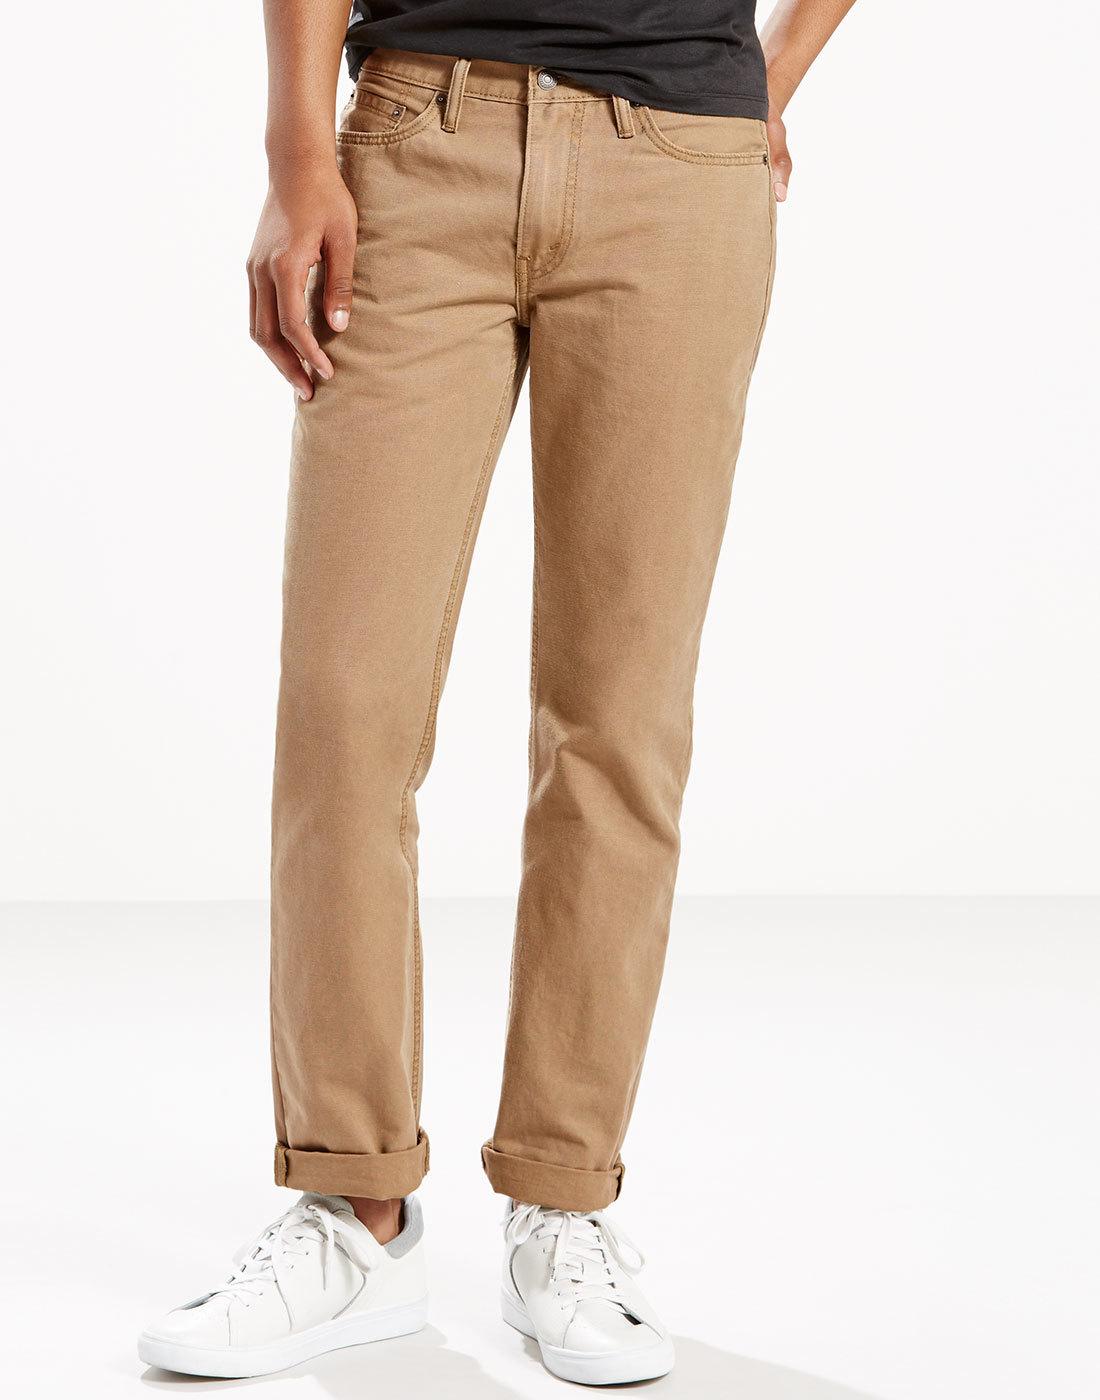 LEVI'S® 514 Regular Straight Cotton Canvas Jeans S